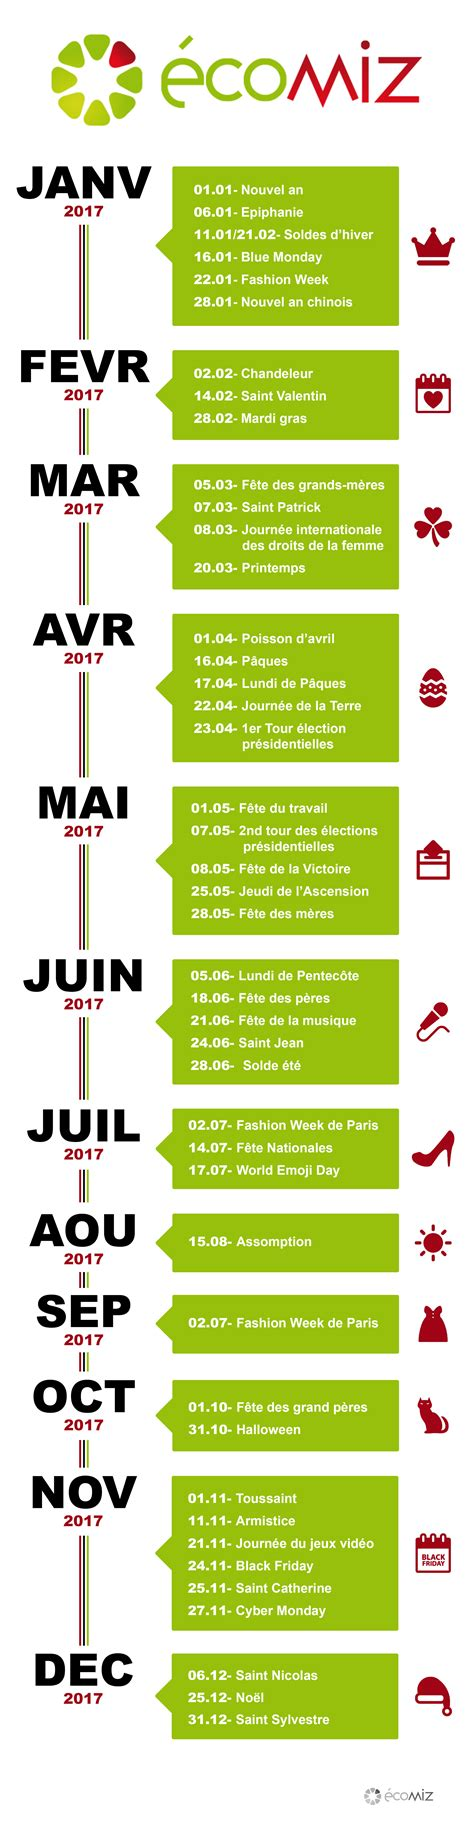 Calendrier En Ligne 2017 Ecomiz Agence Web 224 Calendrier Ecommerce 2017